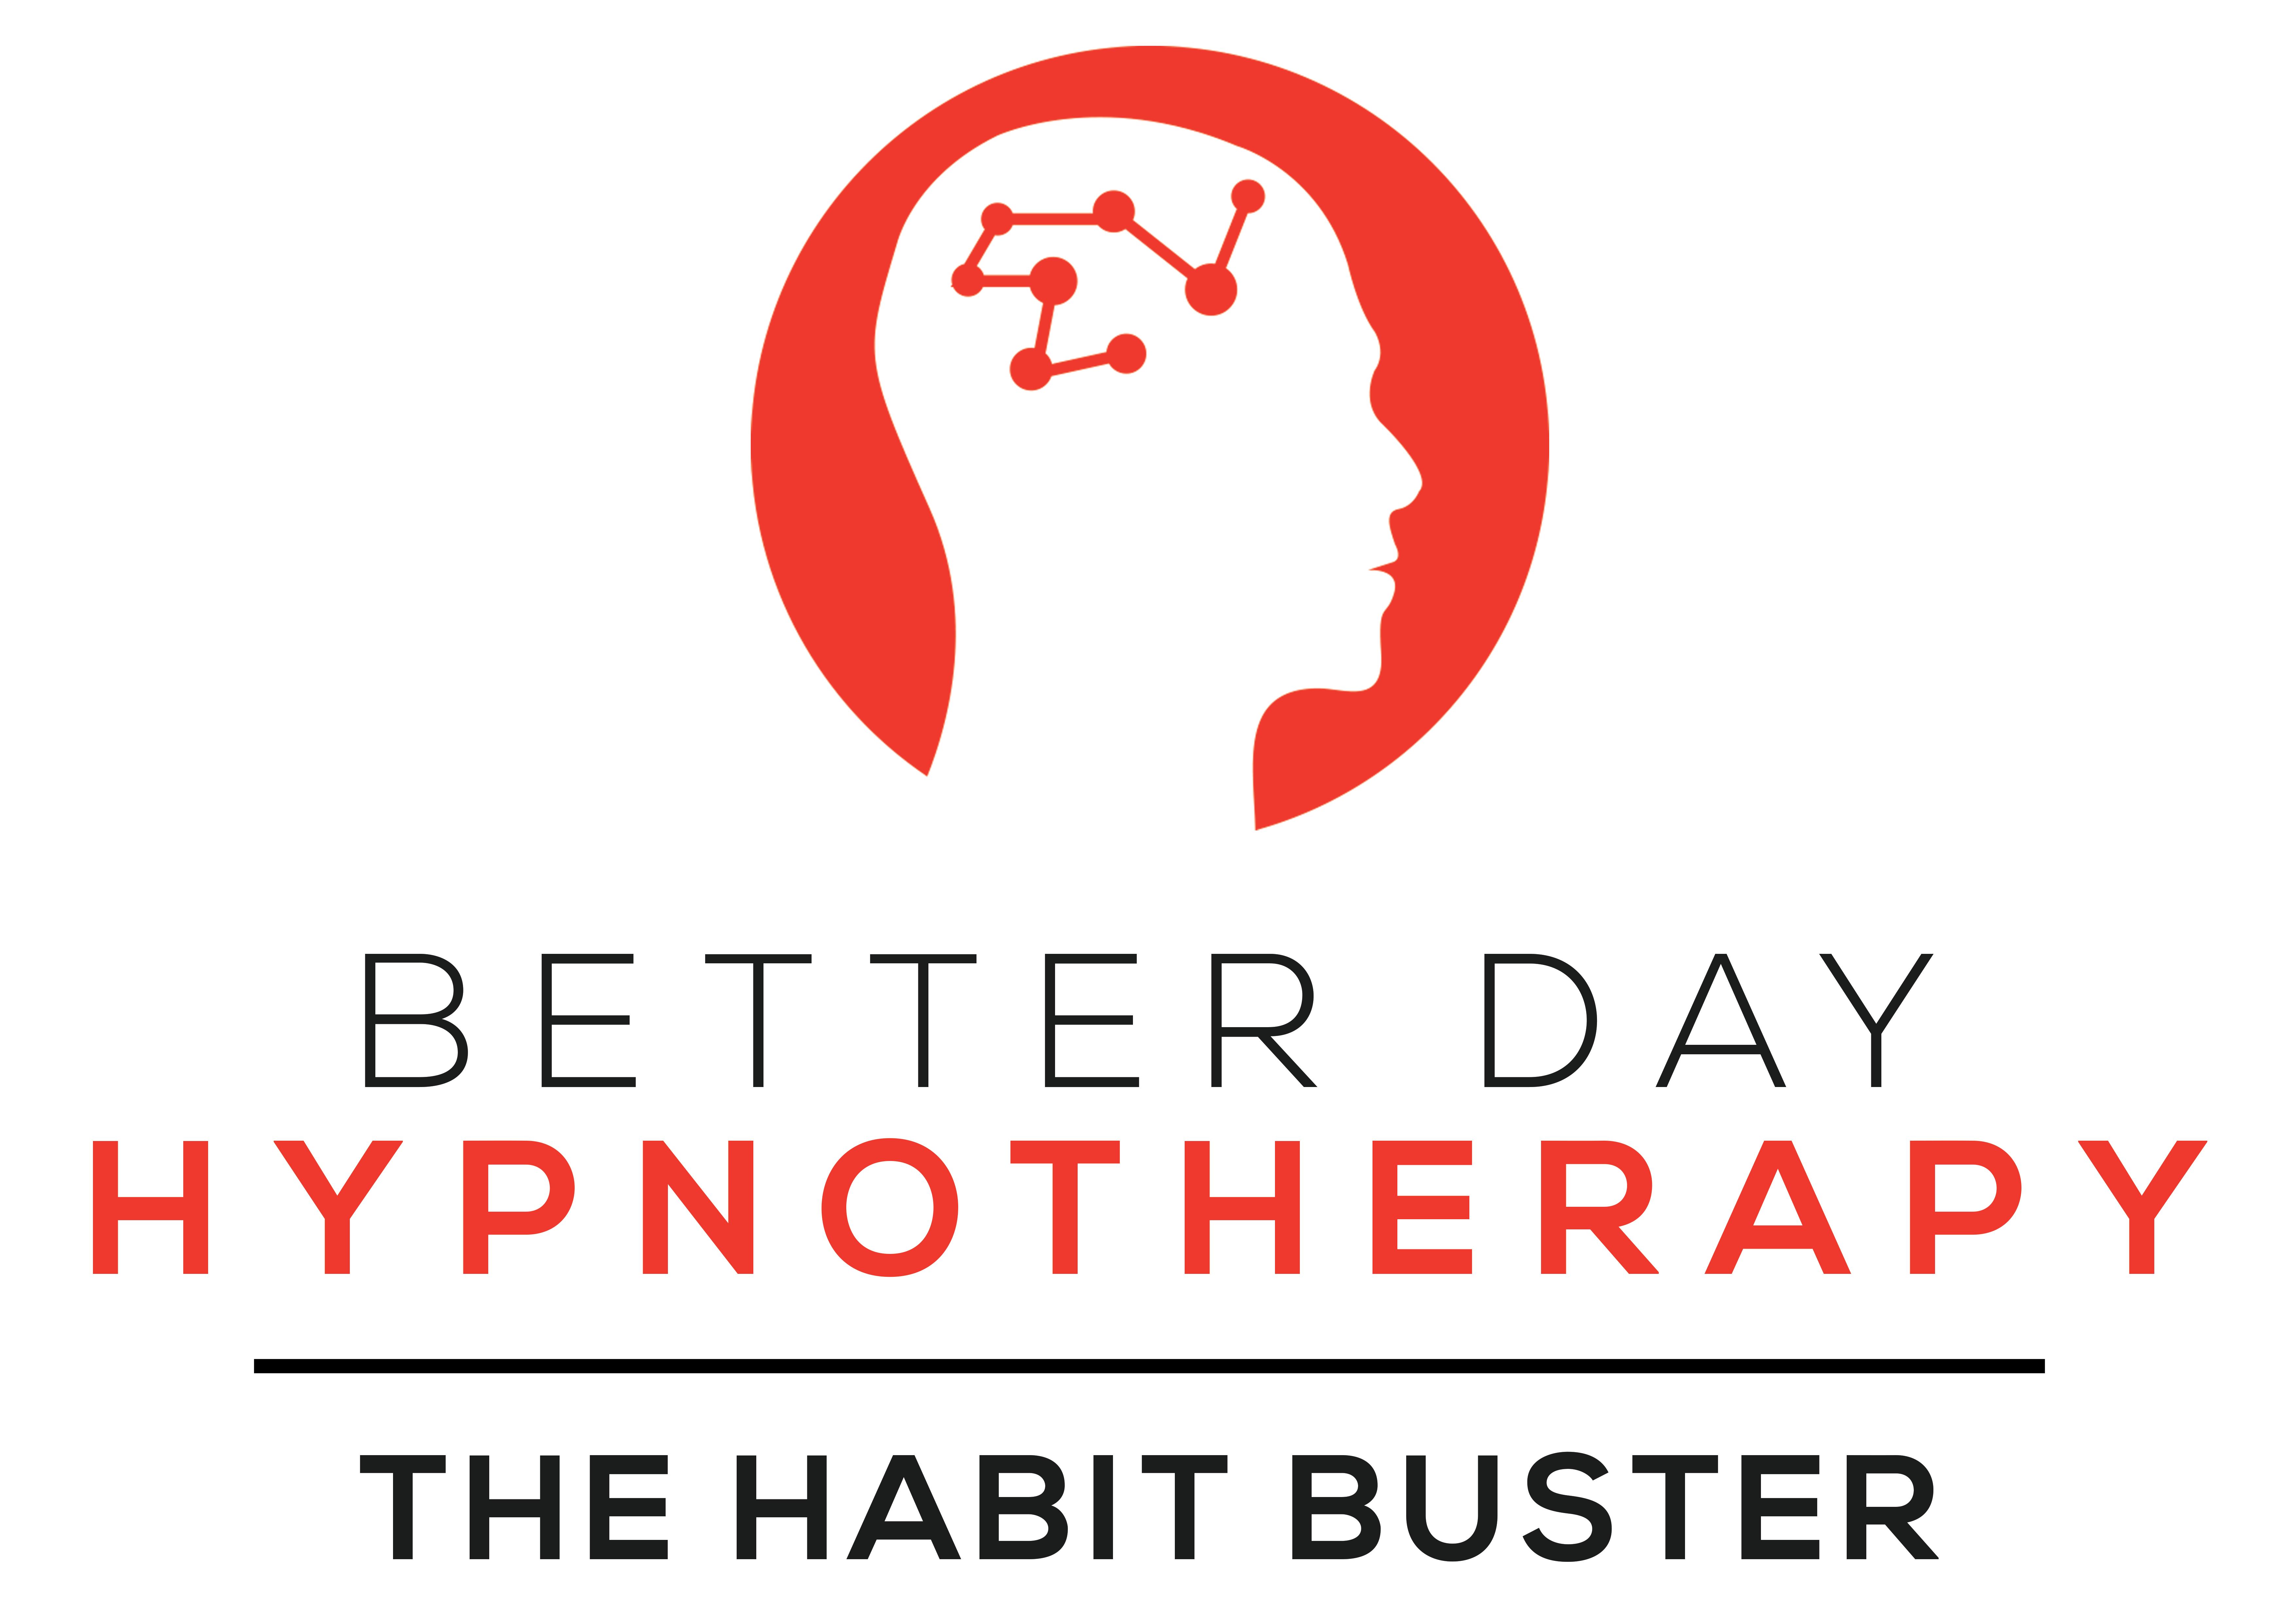 Habit Busters